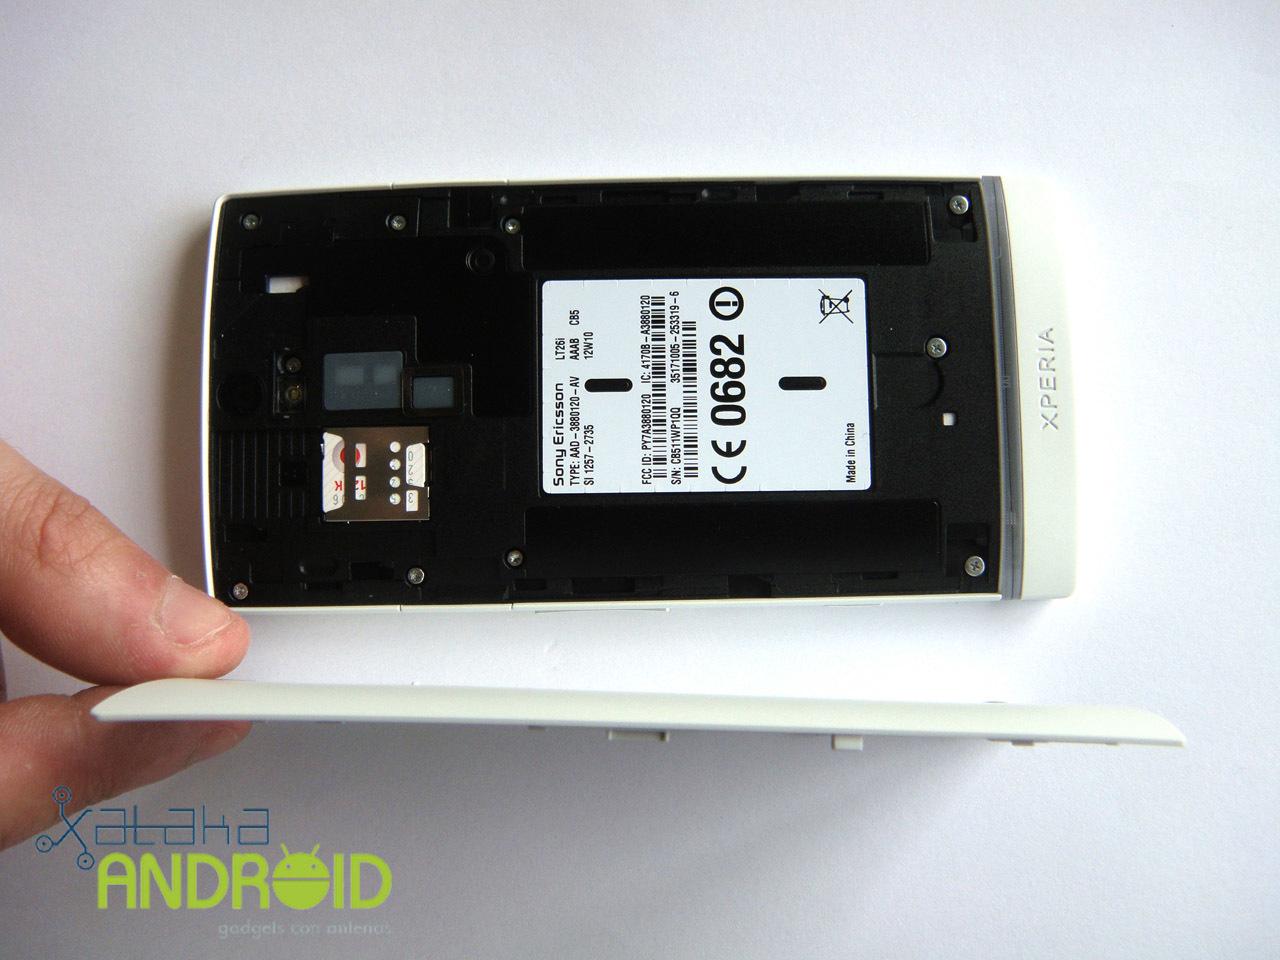 Foto de Sony Xperia S, análisis a fondo (24/50)